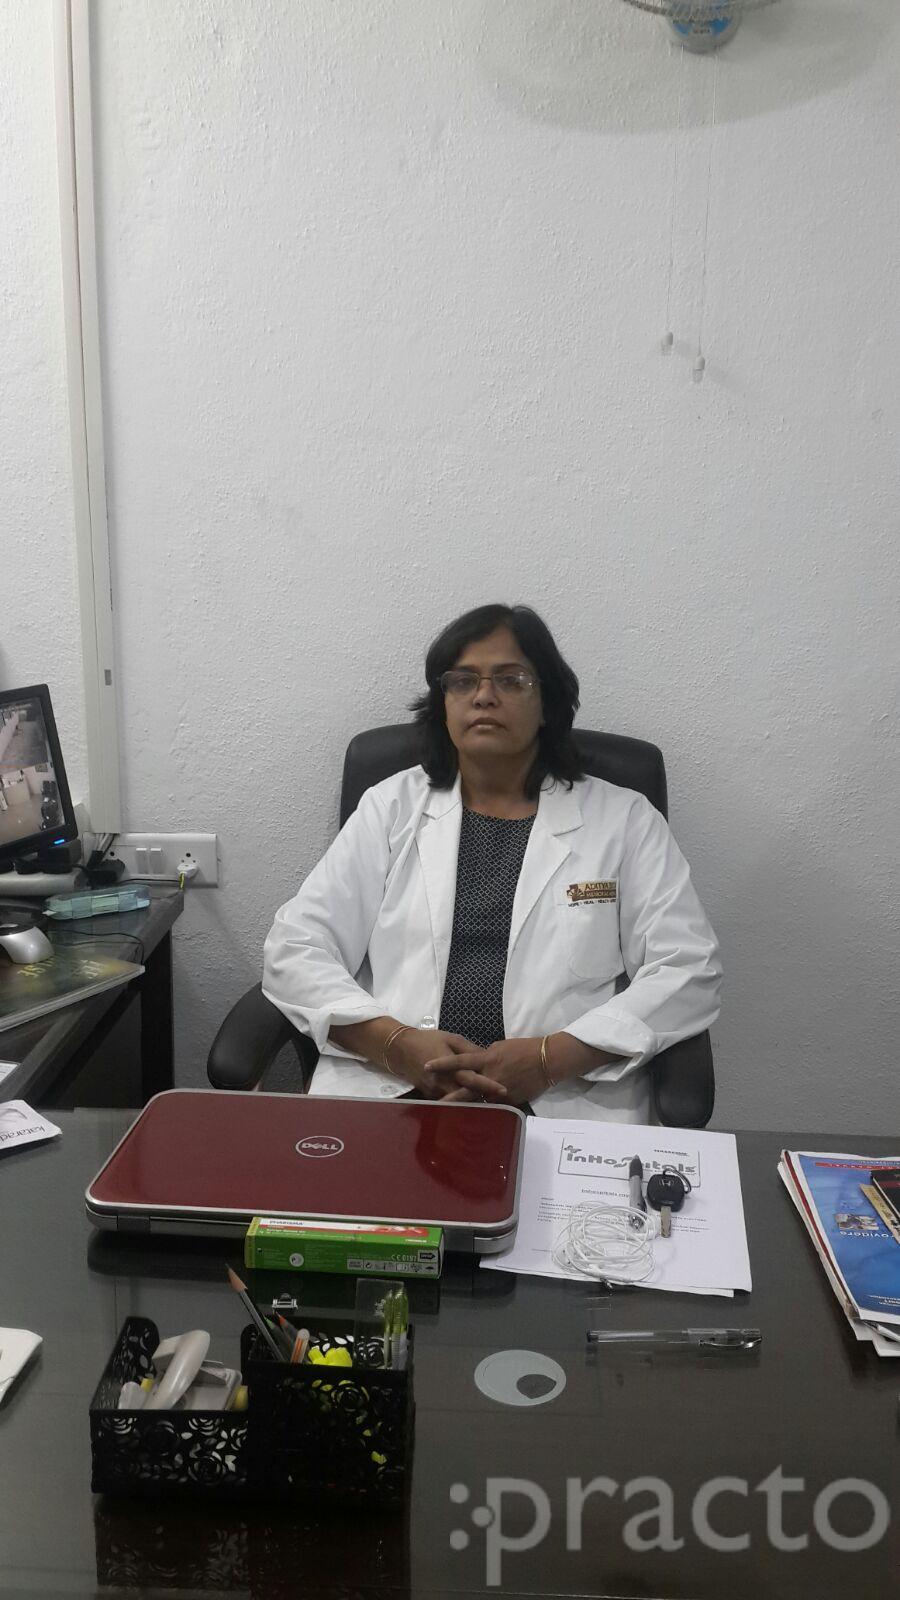 Dr. Anuradha Raina - Dentist